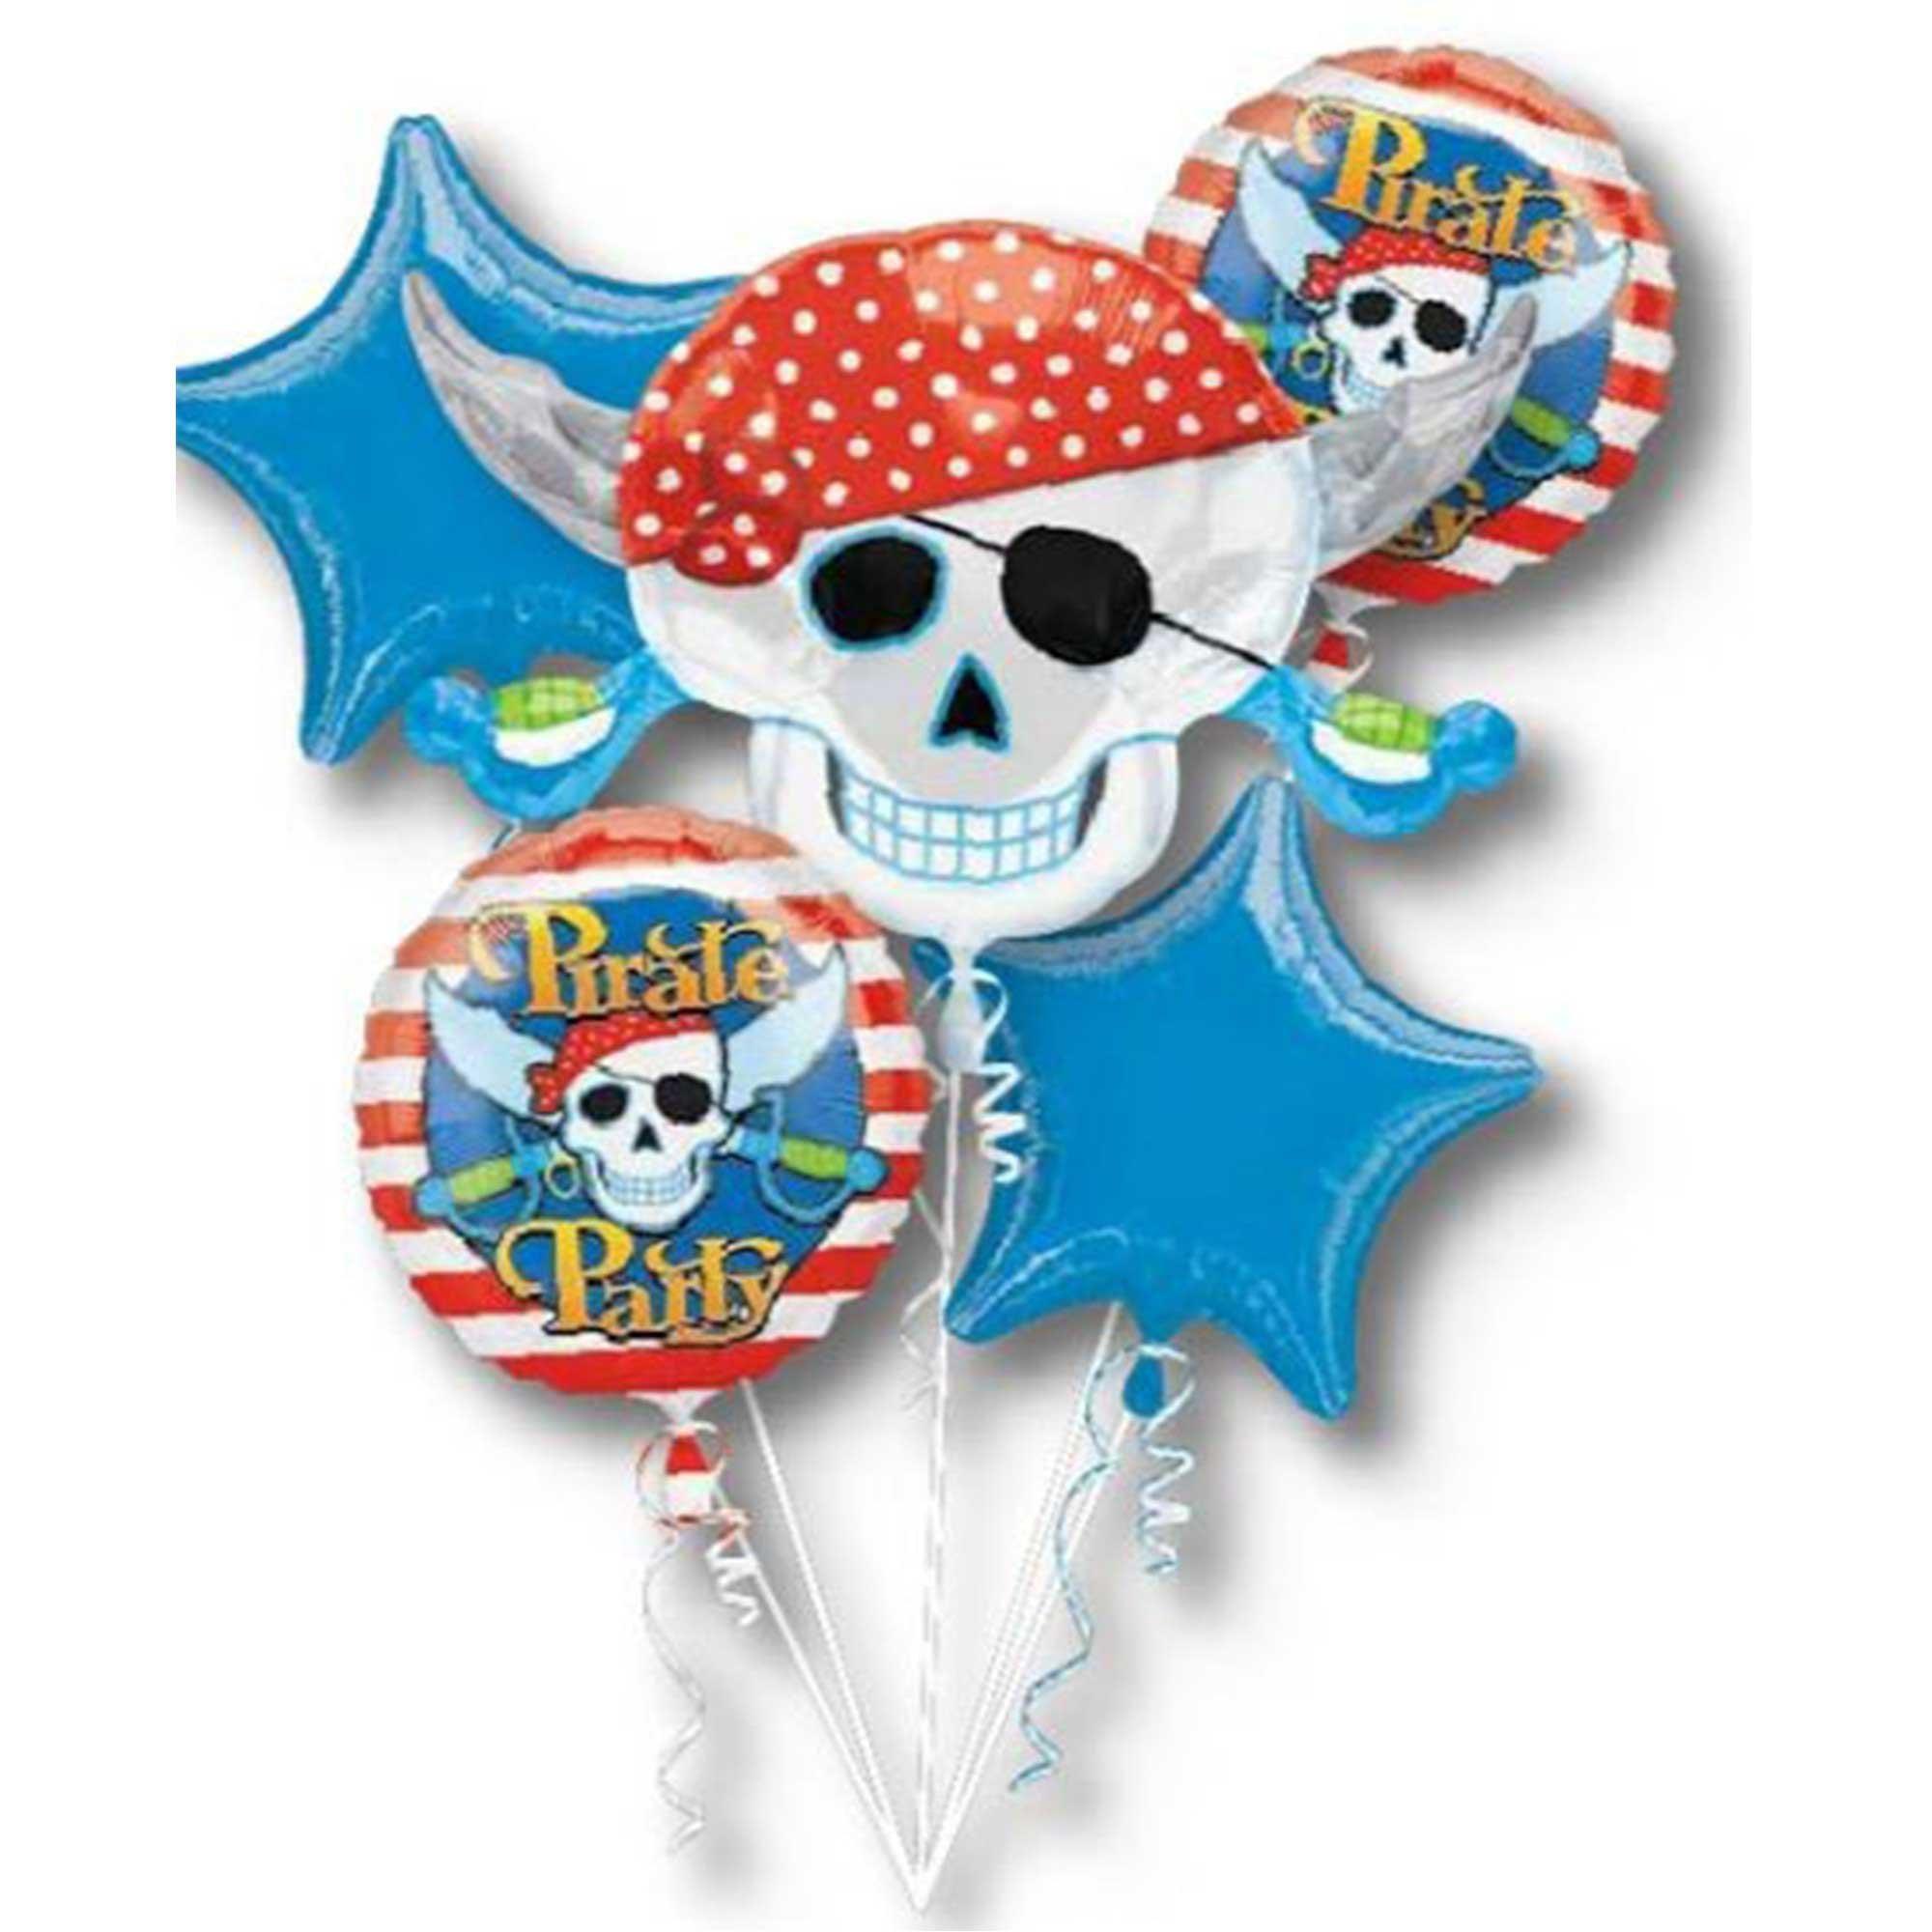 Bouquet Pirate Party P75